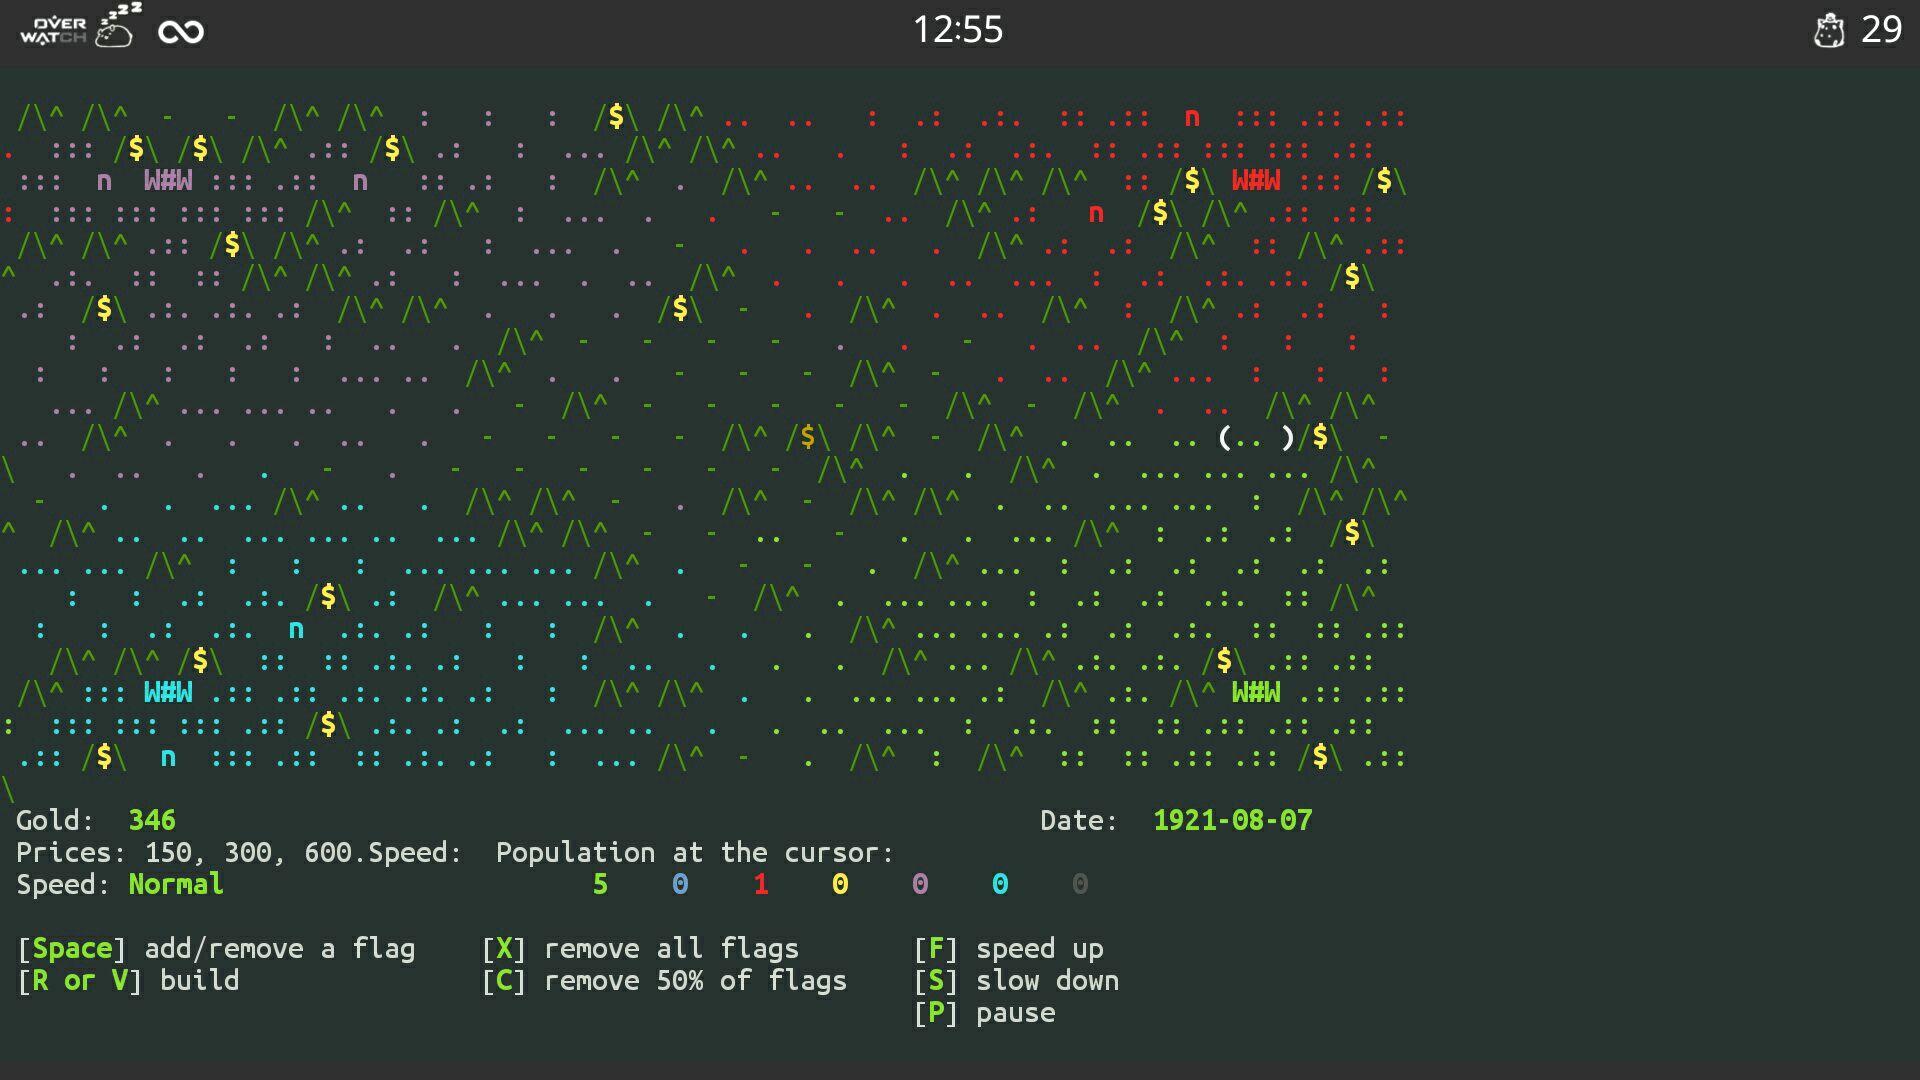 curse of war游戏界面